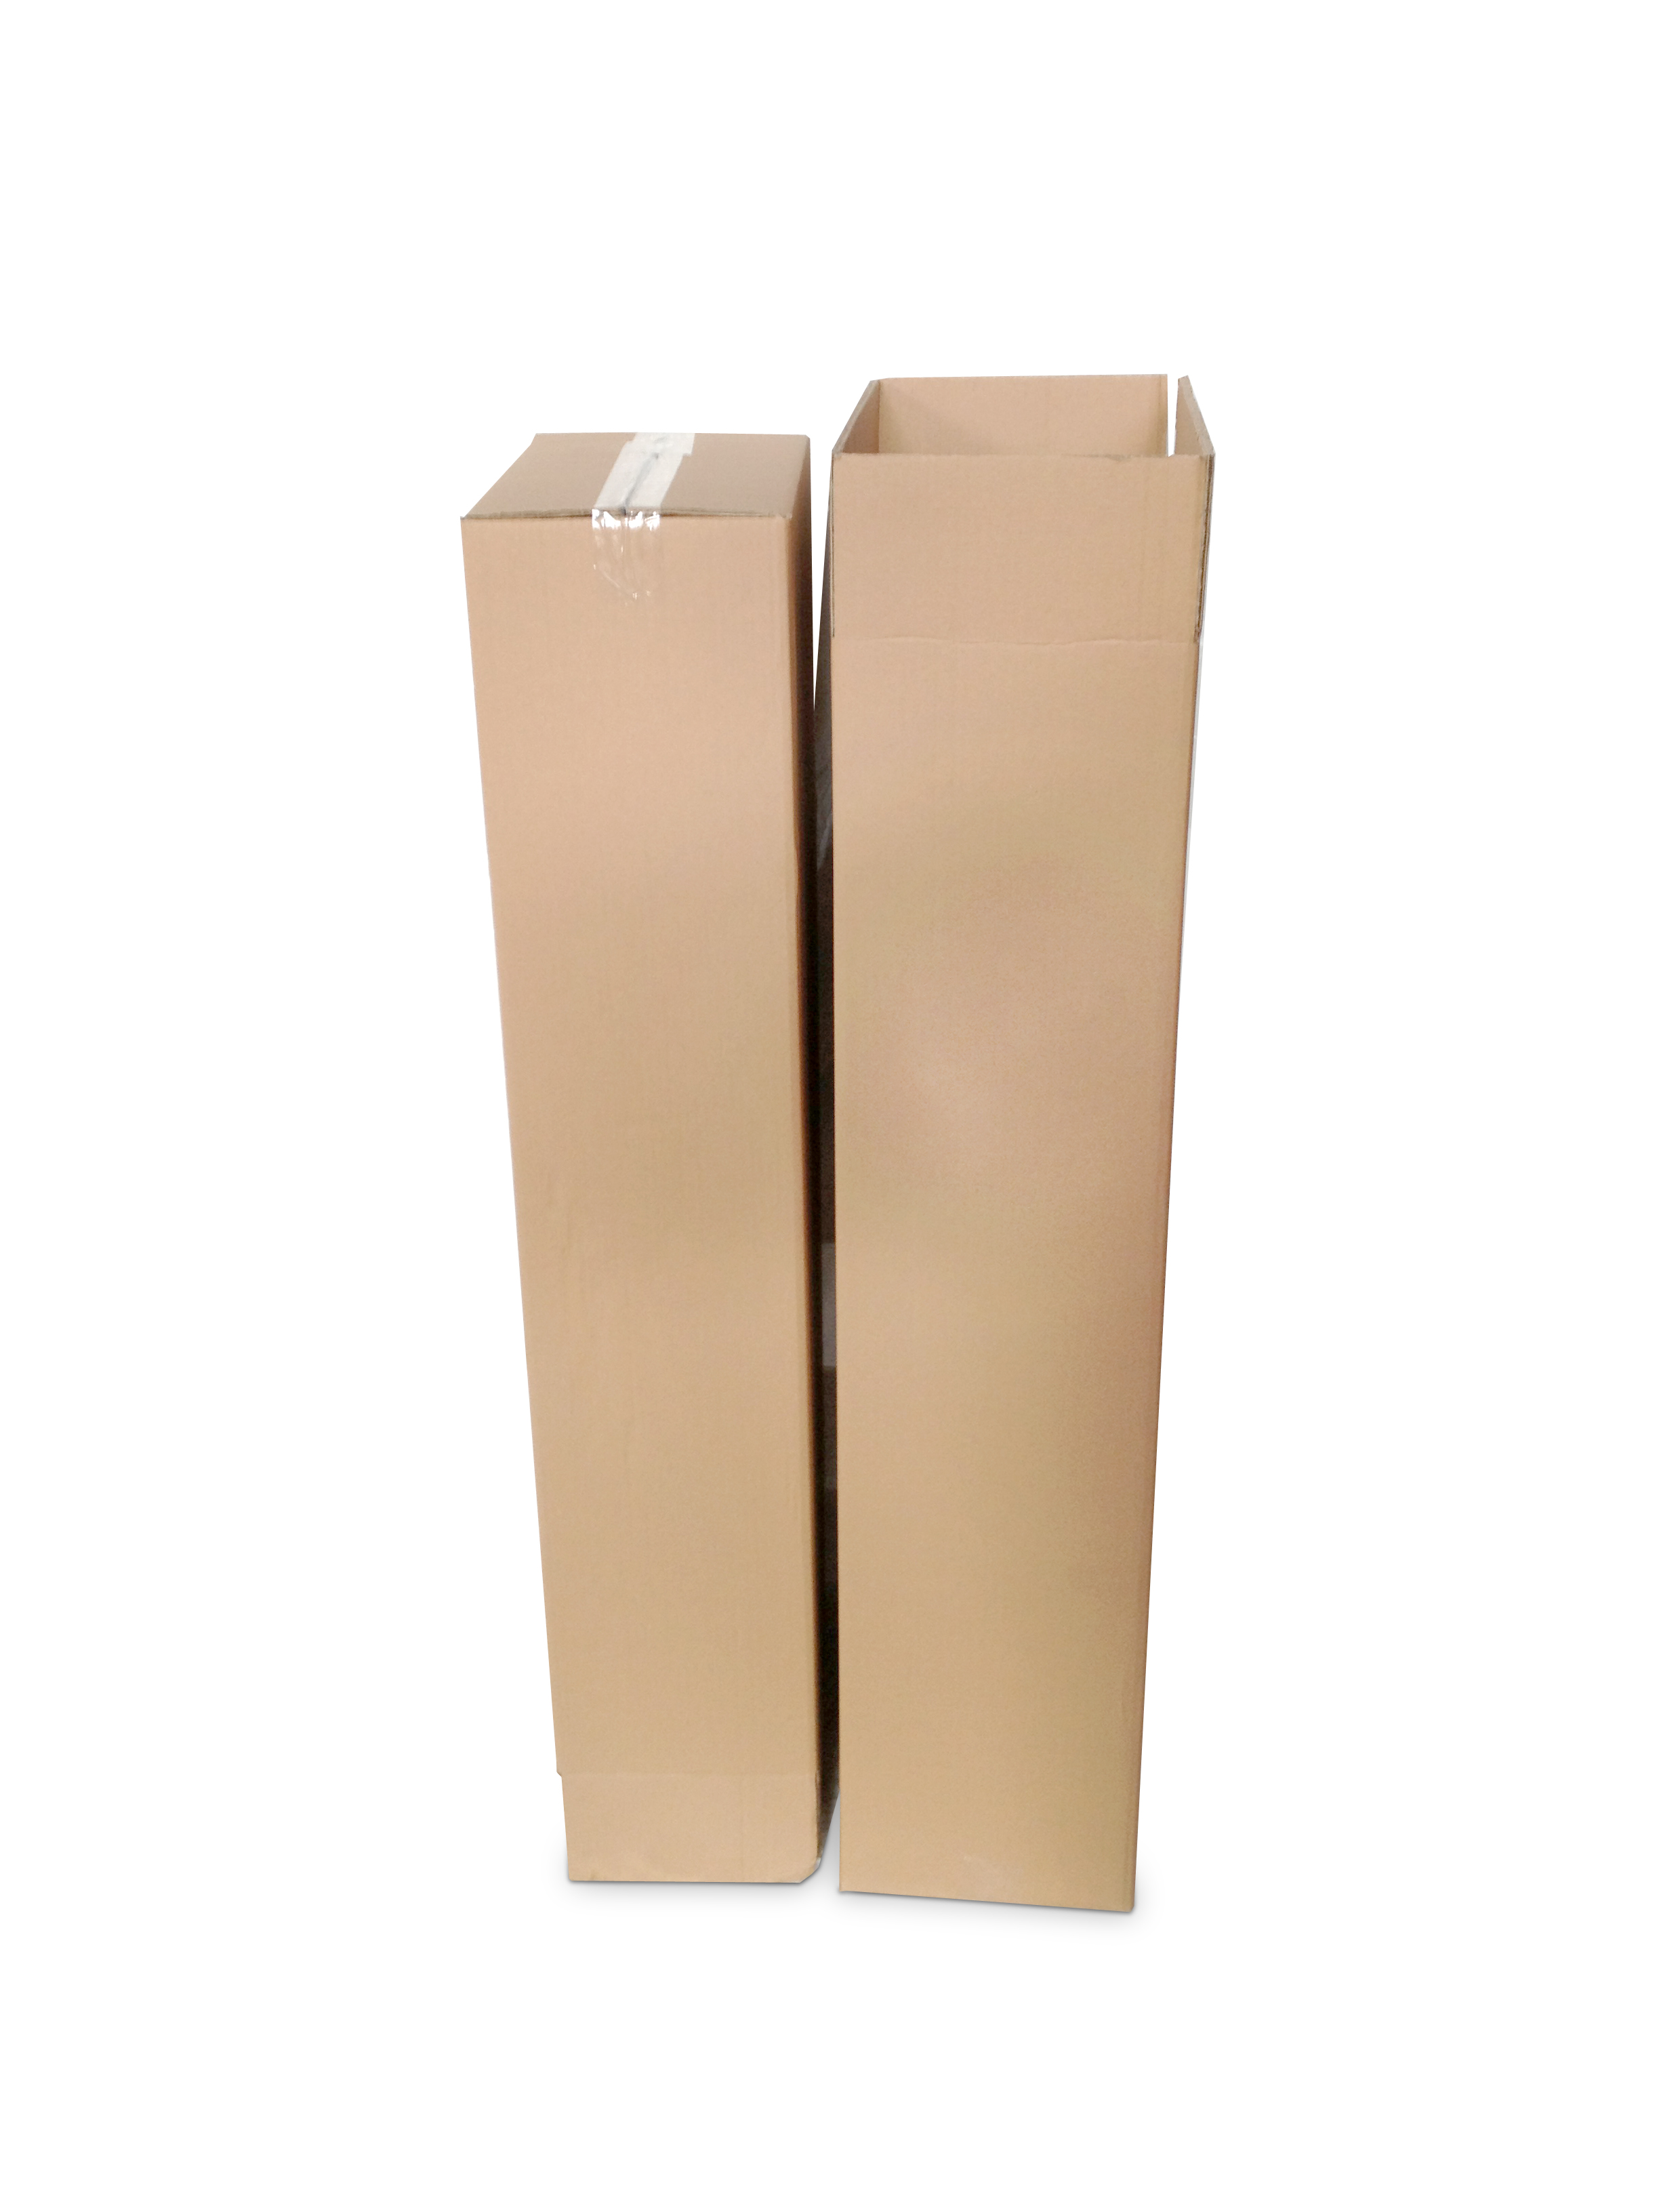 1). beide Kartons aufbauen